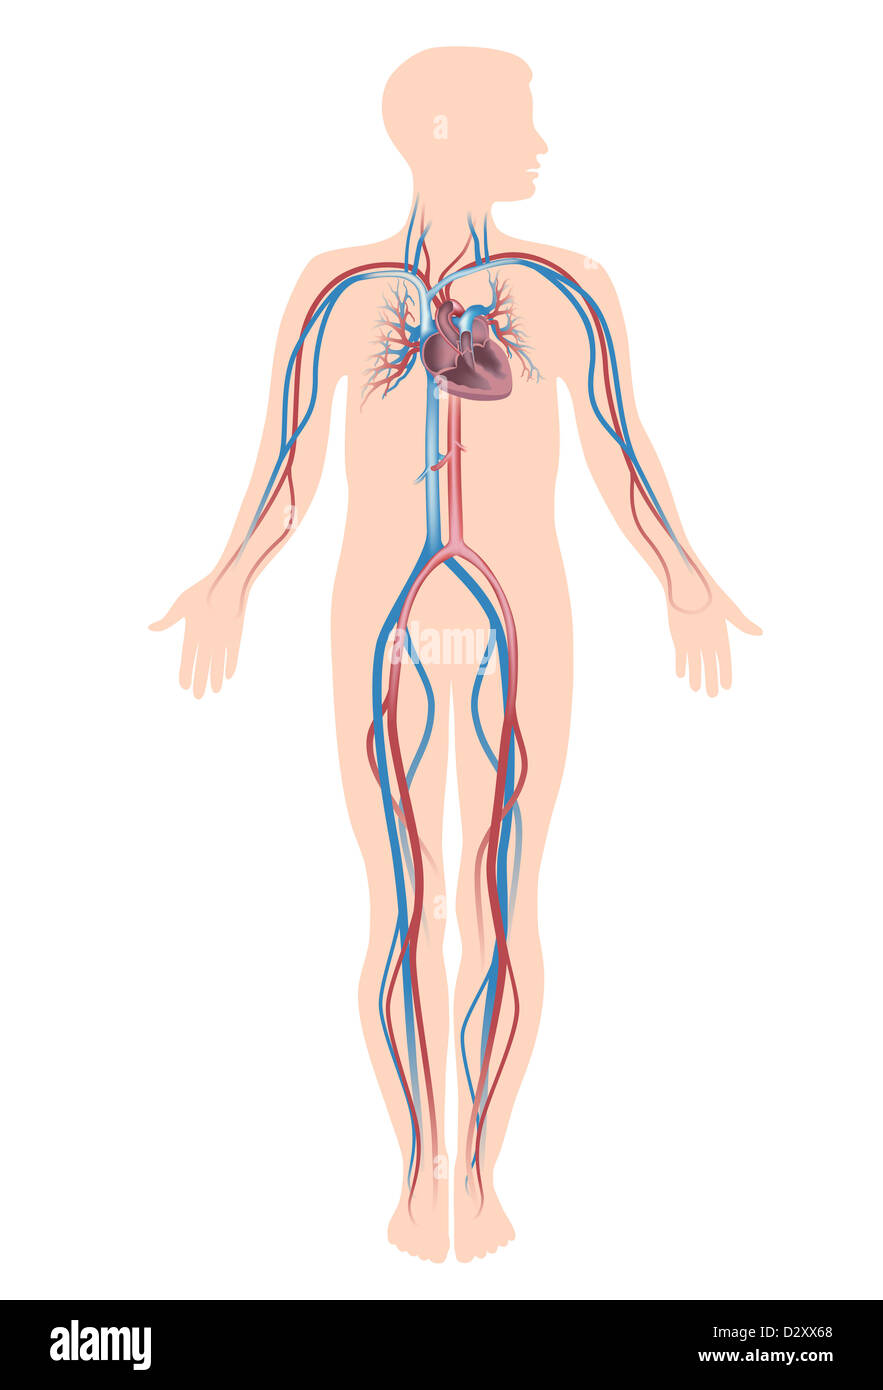 Cardiovascular System Illustration Stock Photos Cardiovascular